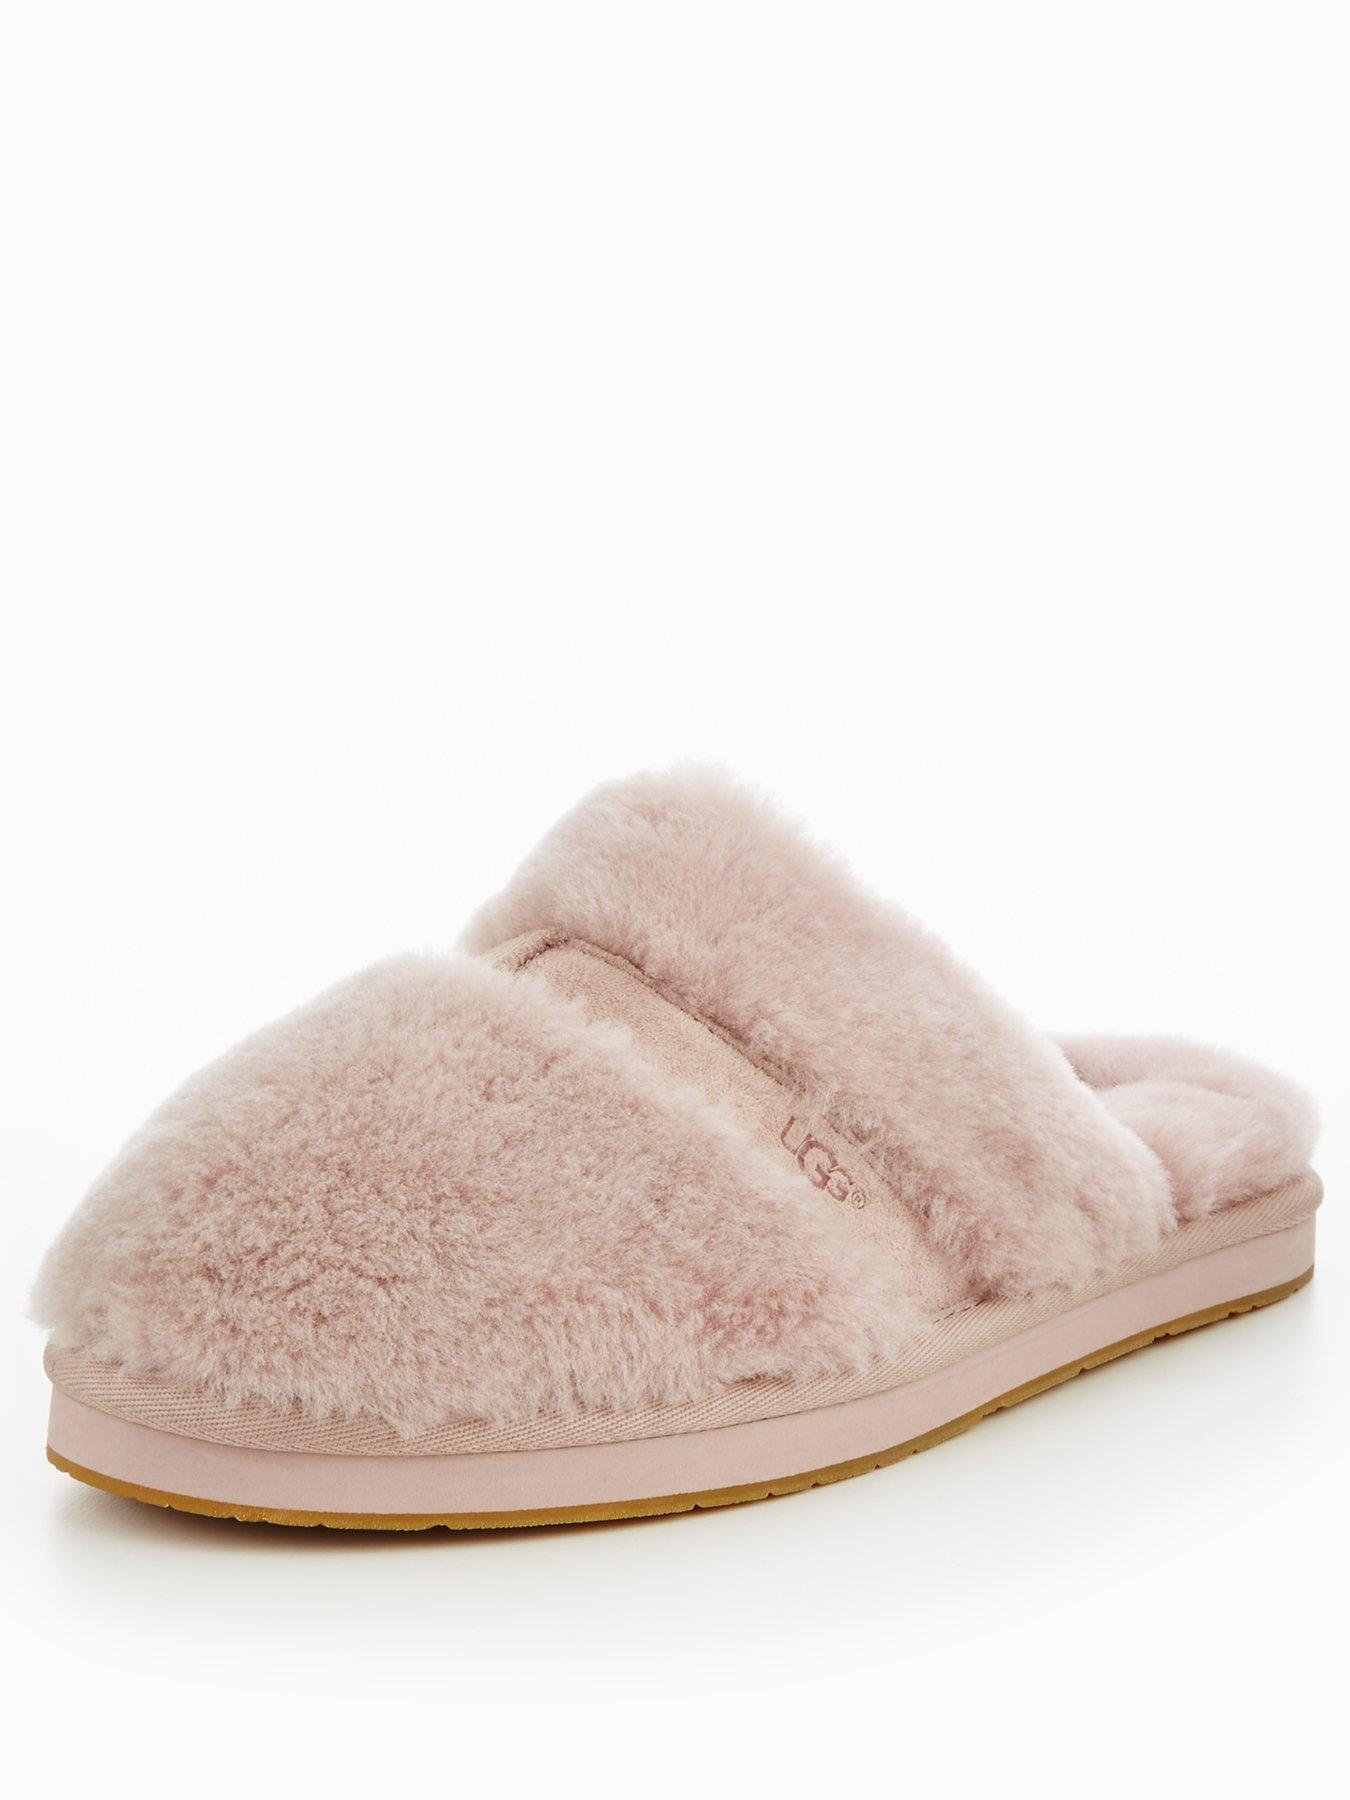 UGG Dalla Slipper 1600194442 Women's Shoes UGG Slippers